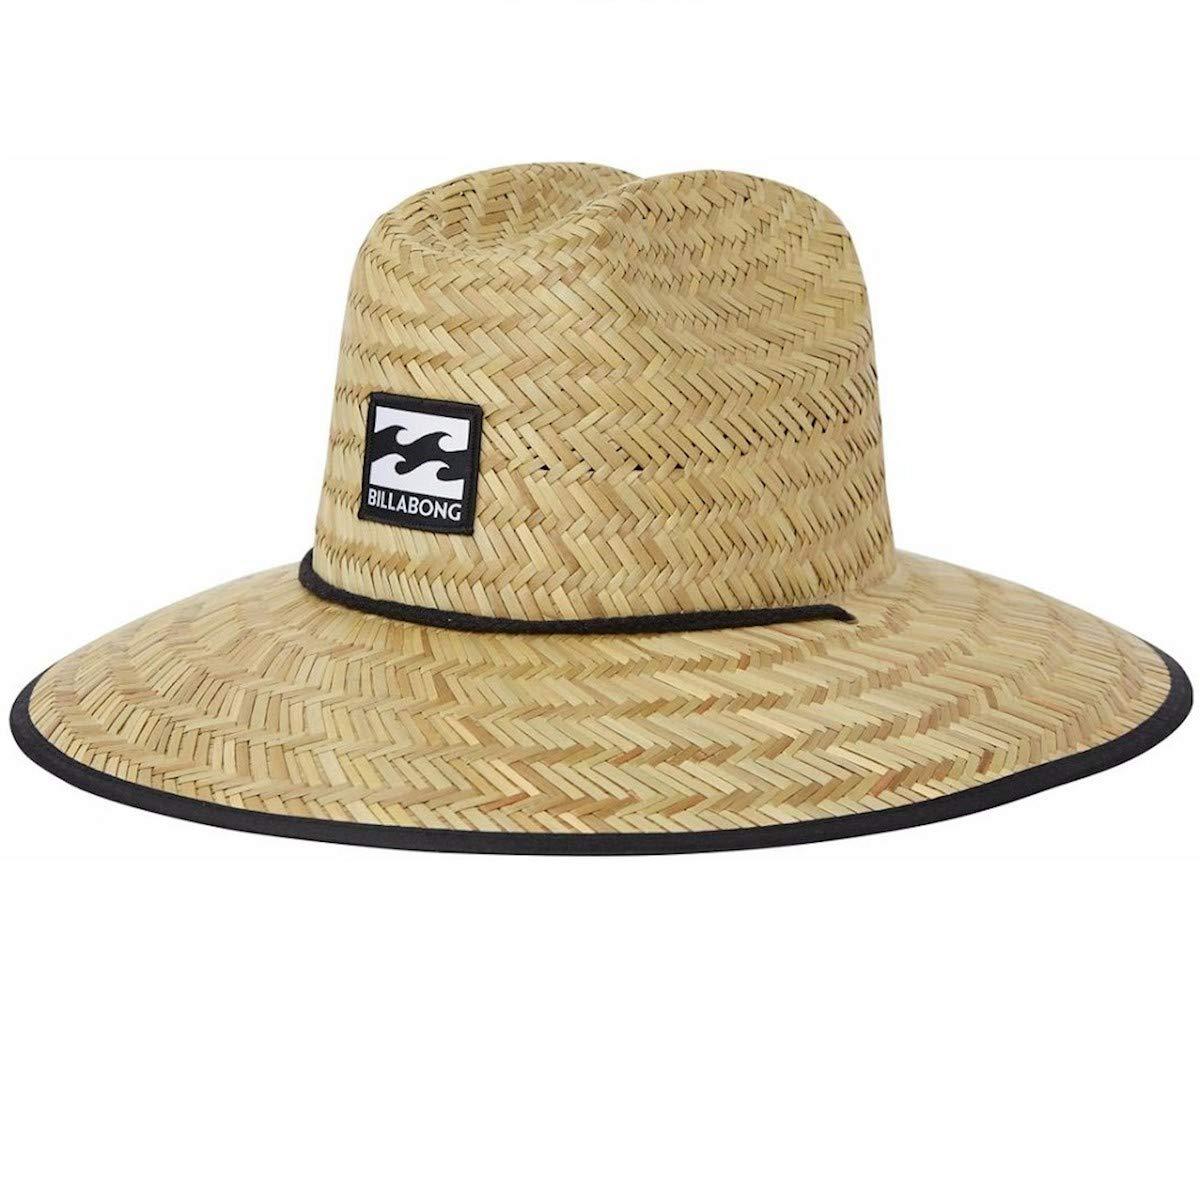 Chapéu de Palha Surf Billabong Tides Pipe Print  Amazon.com.br  Amazon Moda b4f6562ce43